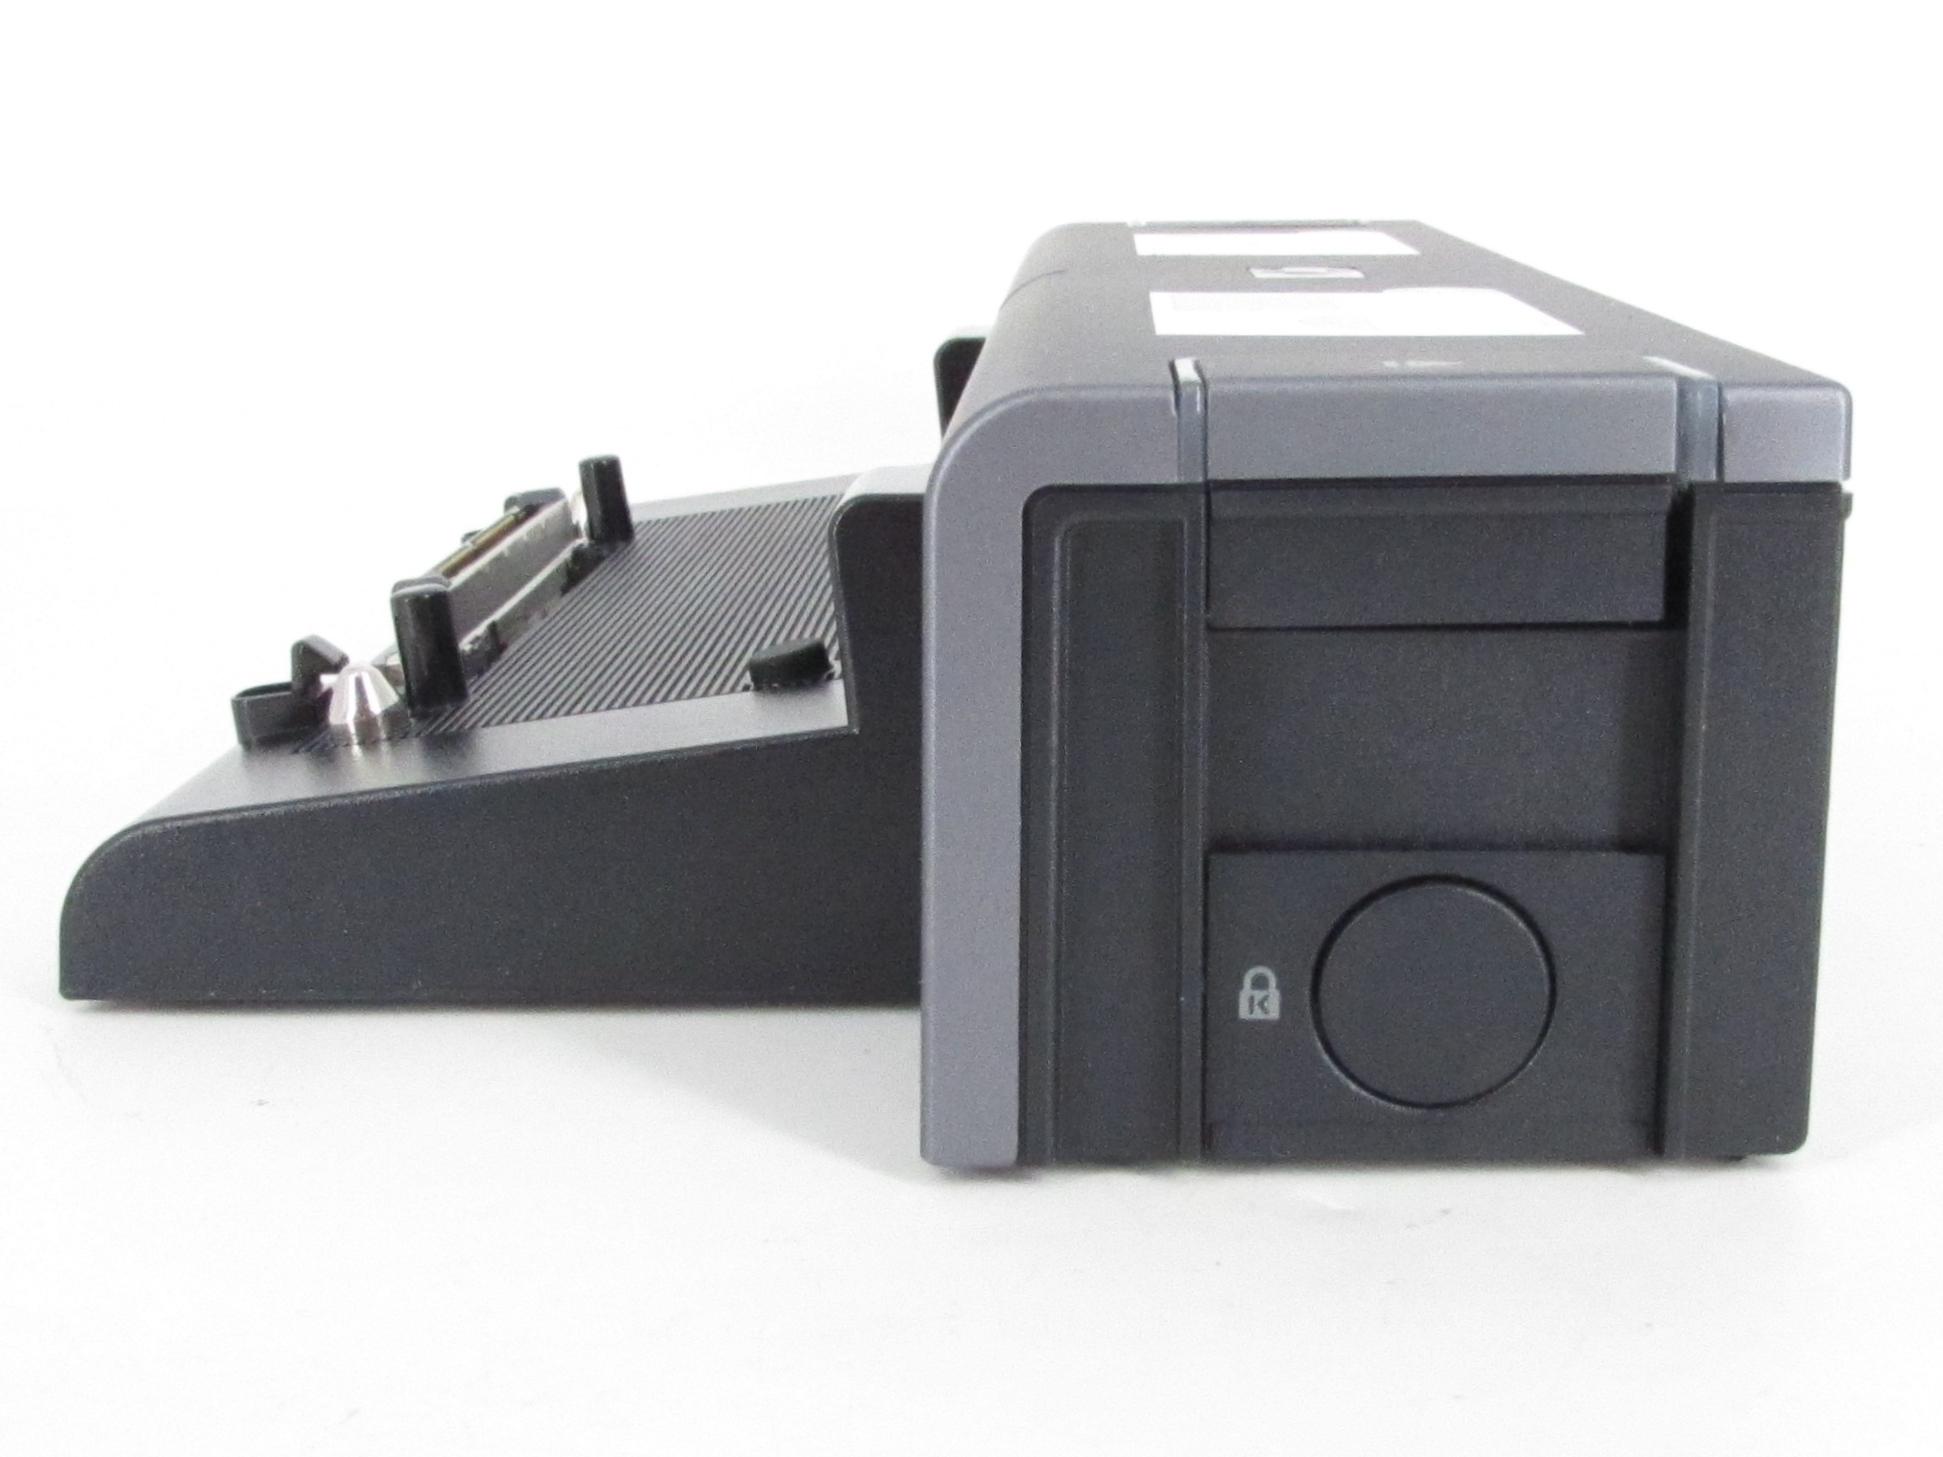 HP Compaq 6720t 6910p 8710p Advanced Docking Station Port Replicator PA287A